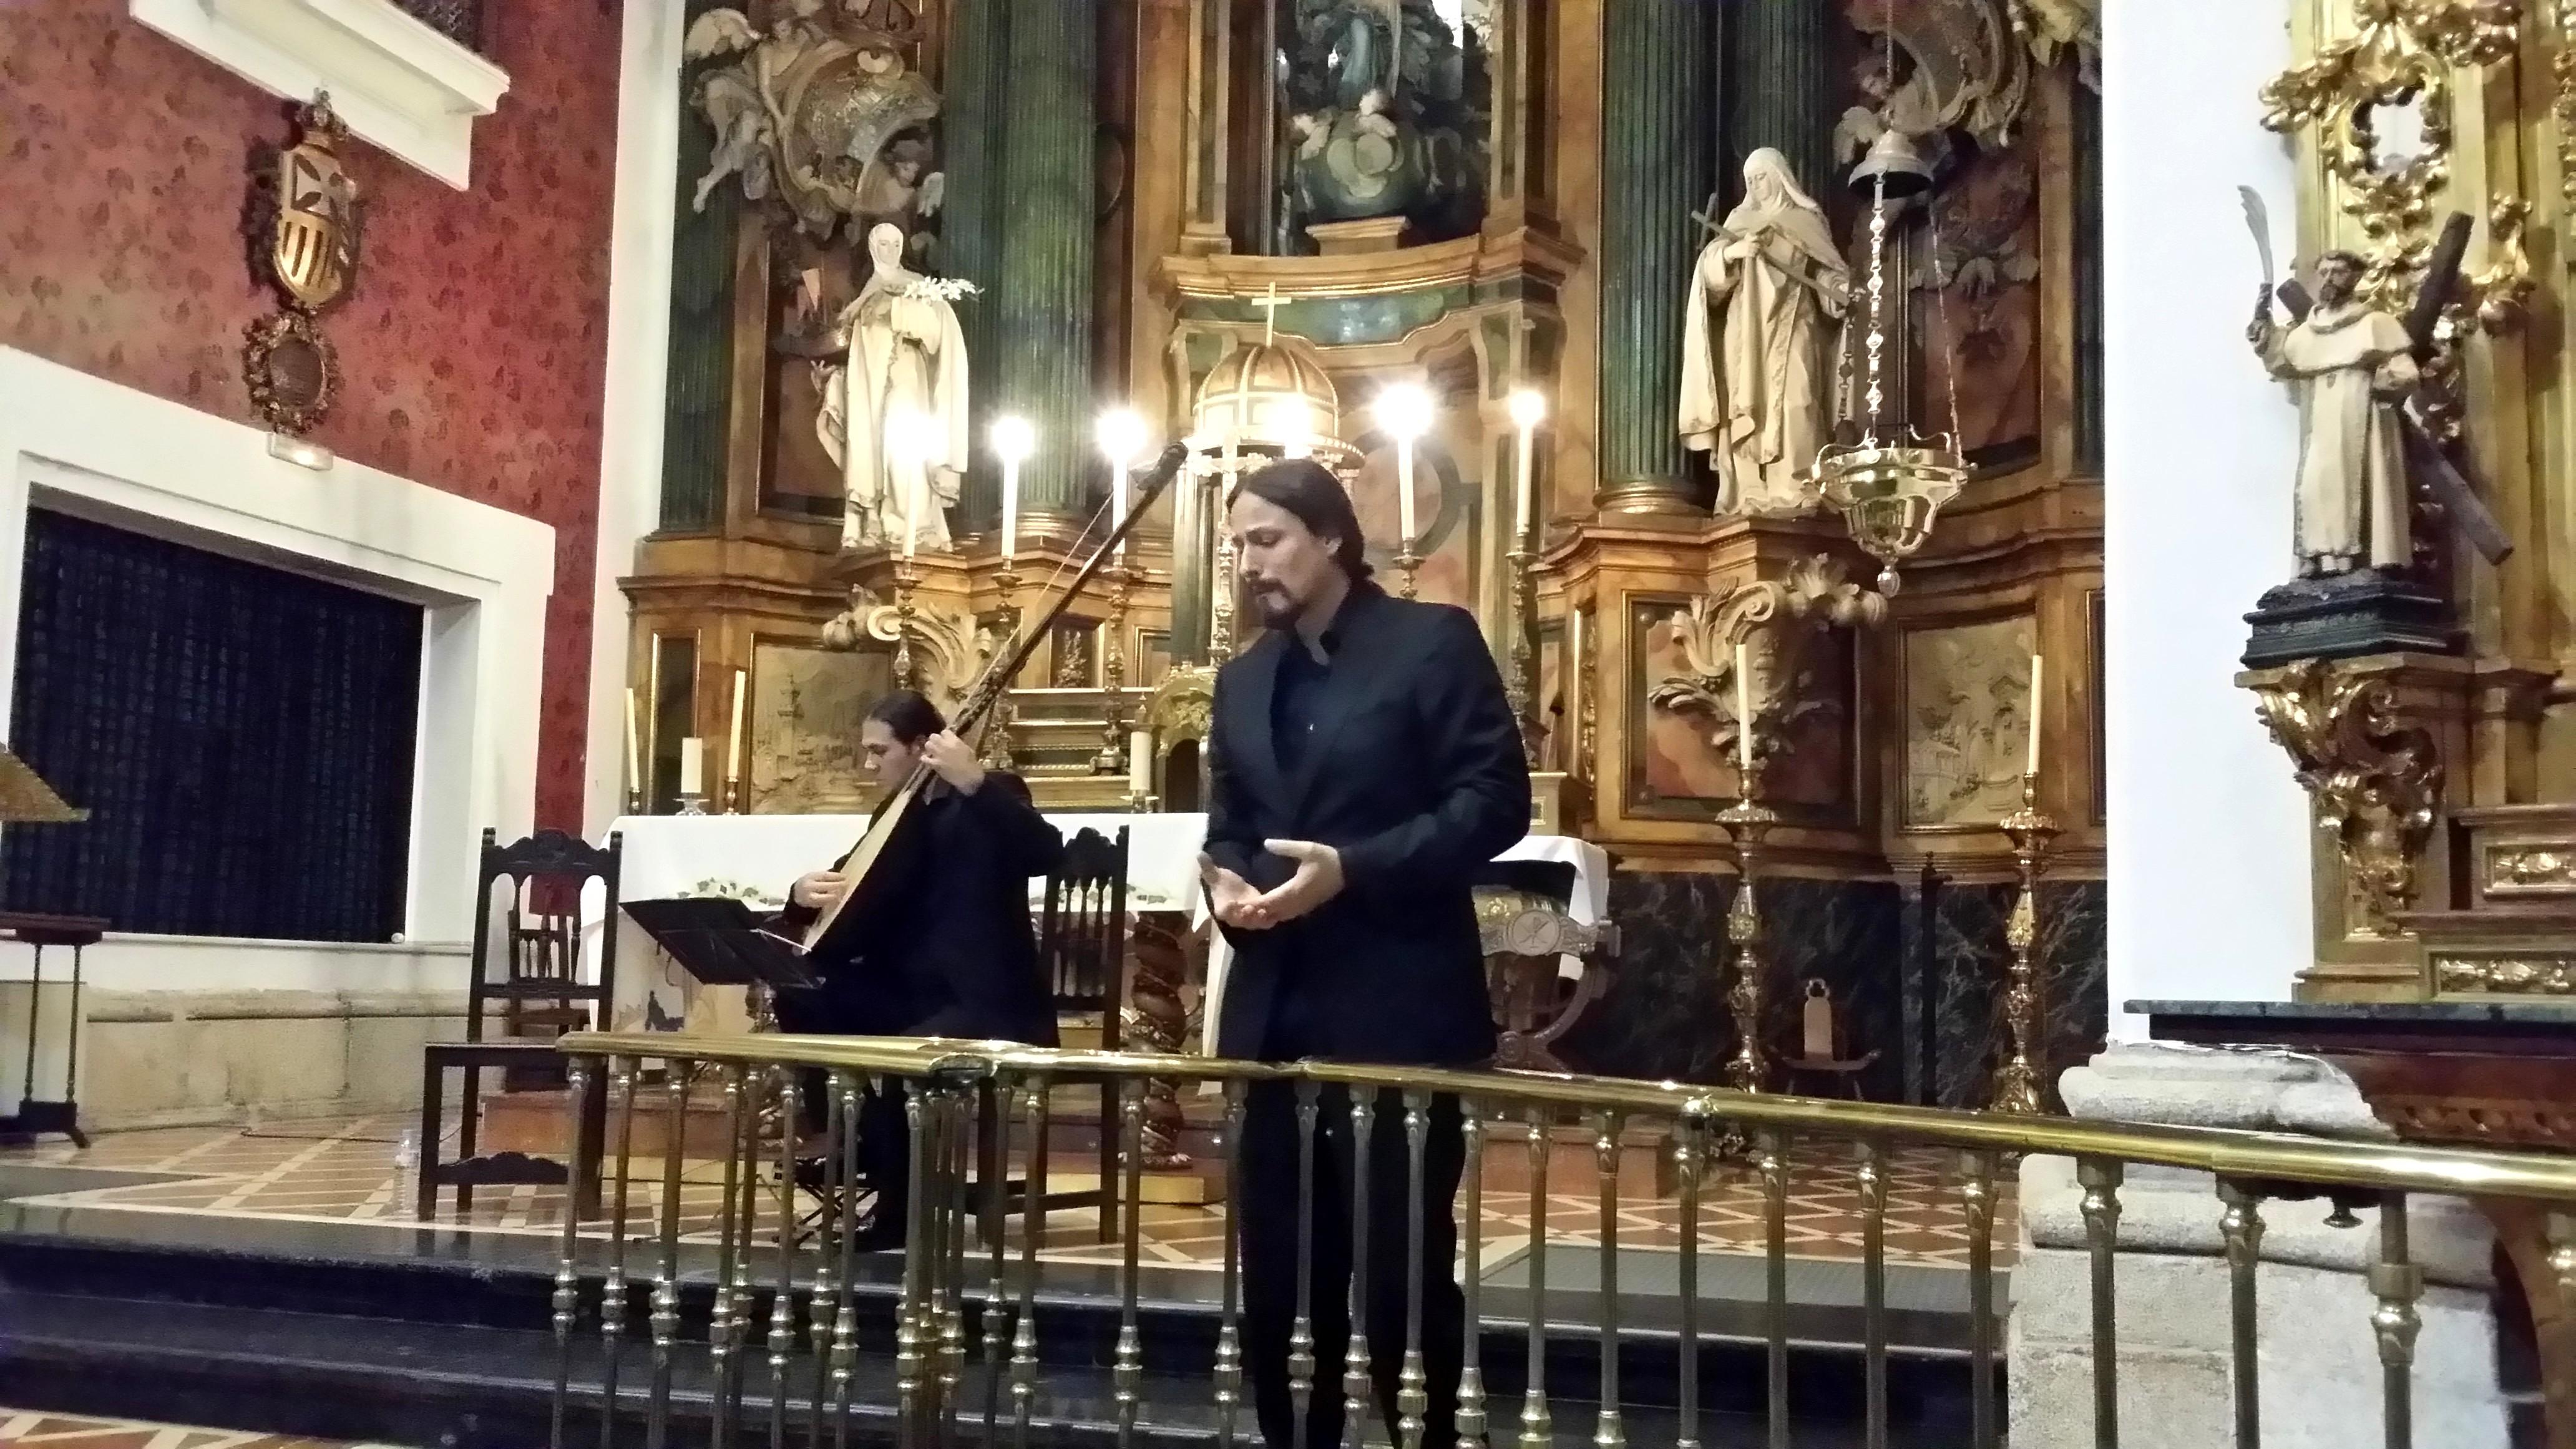 Homenaje al contratenor Baldasare Ferri en la Iglesia de las Mercedarias Góngoras